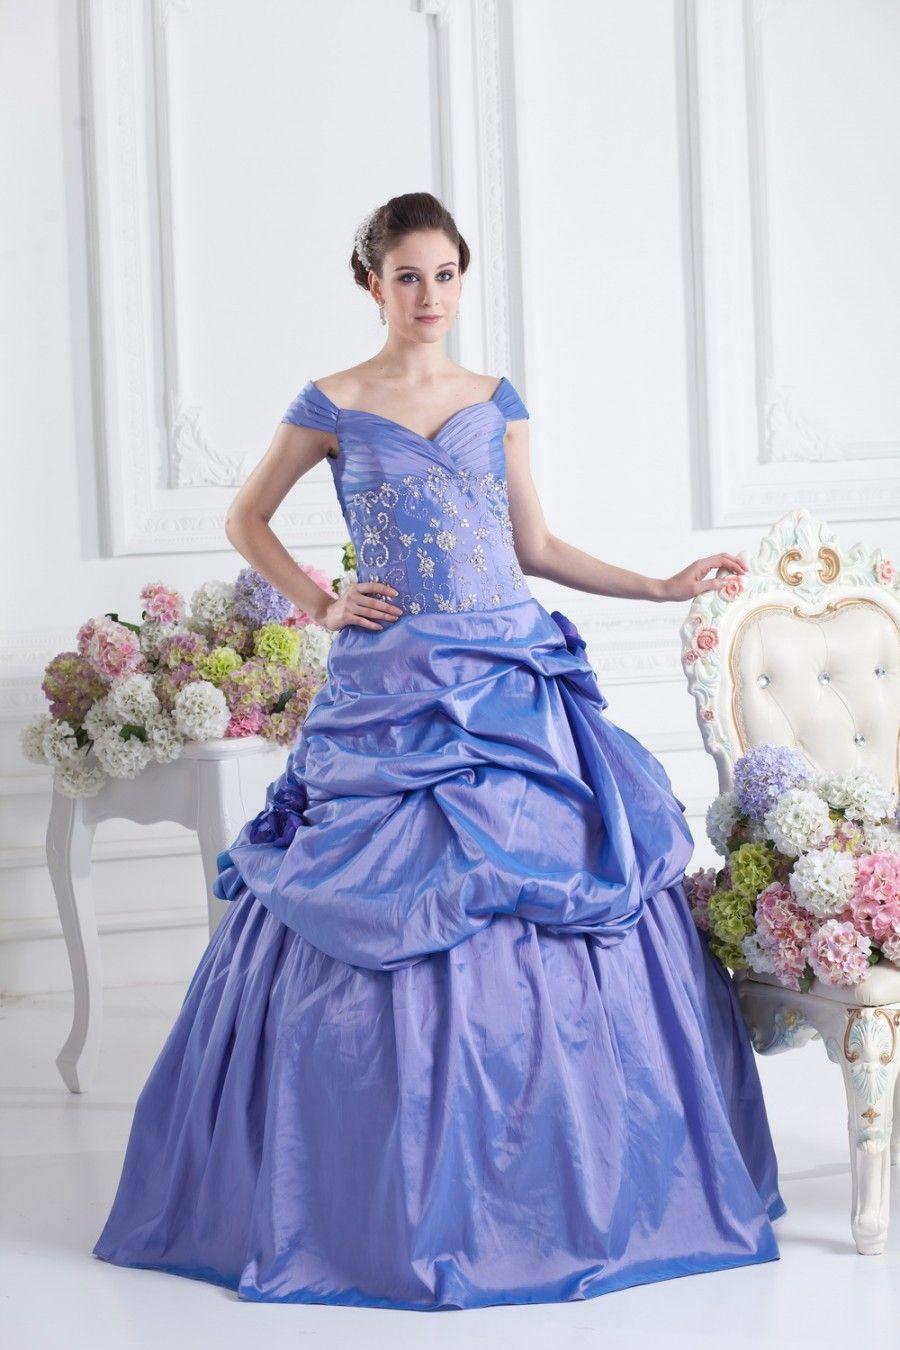 Carmen Ausschnitt Herz Ausschnitt Prinzessin Taft Hochzeitskleid ...